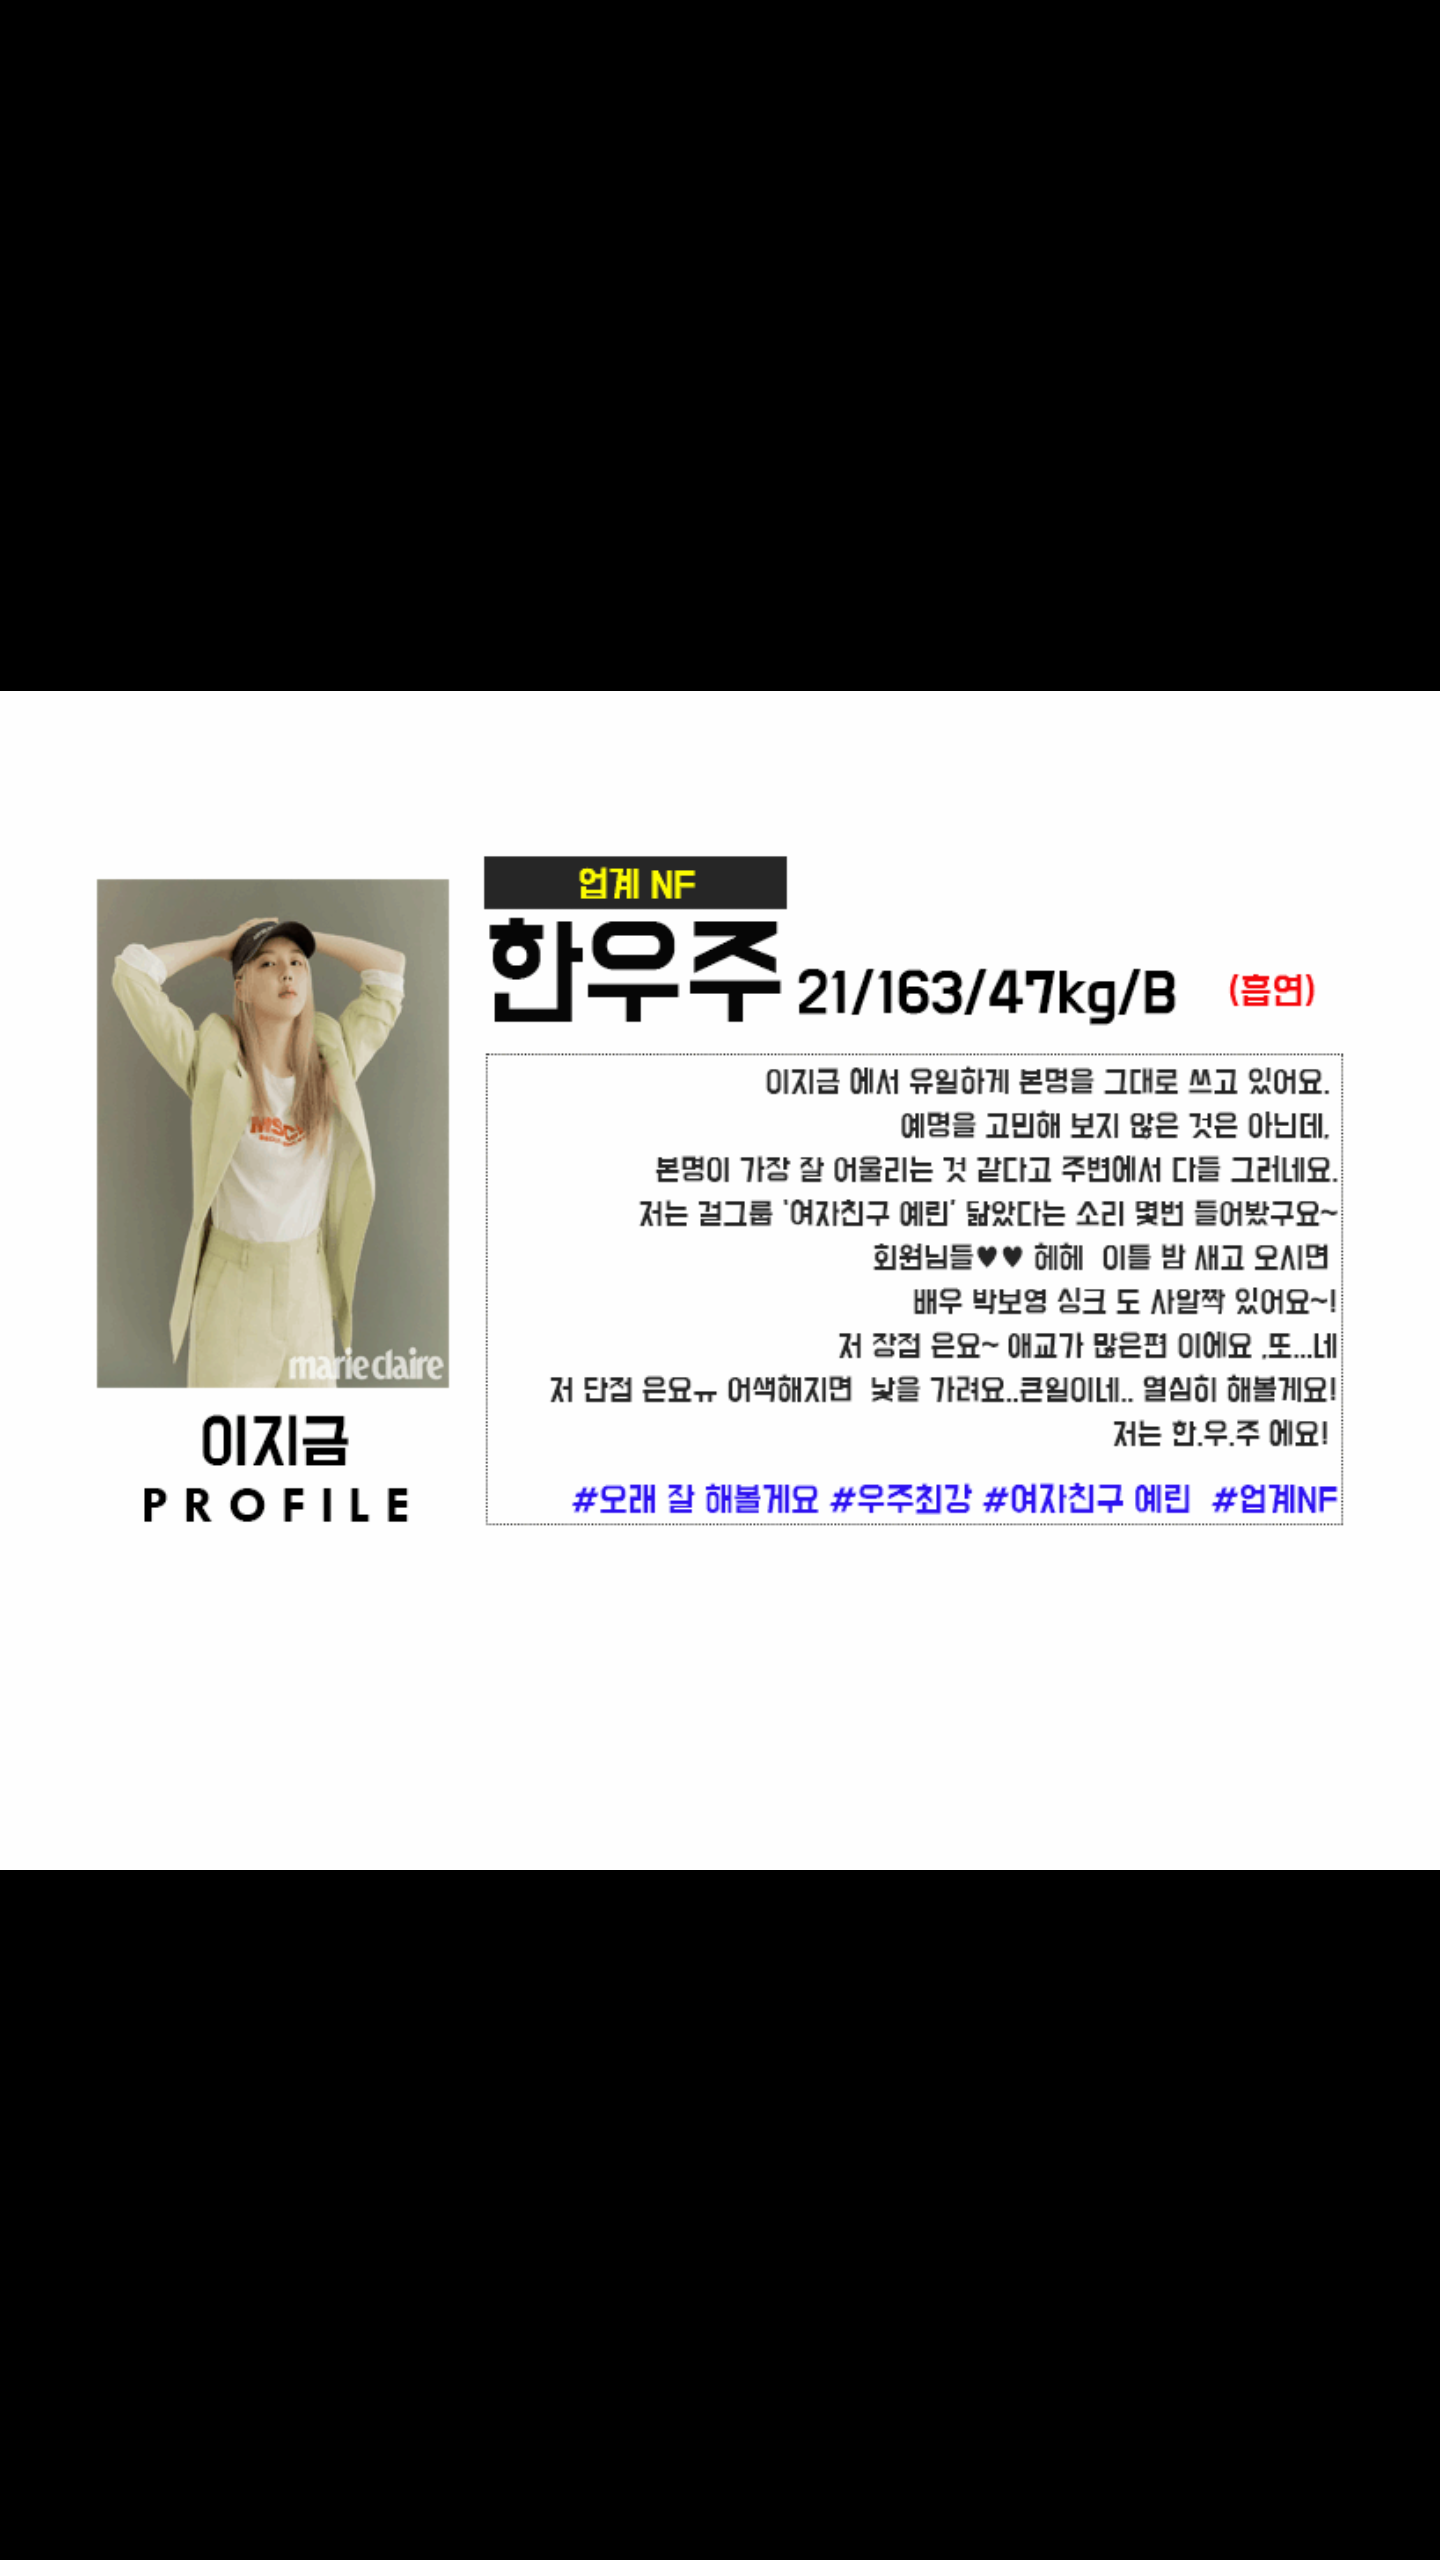 Screenshot_20201016-123753.png